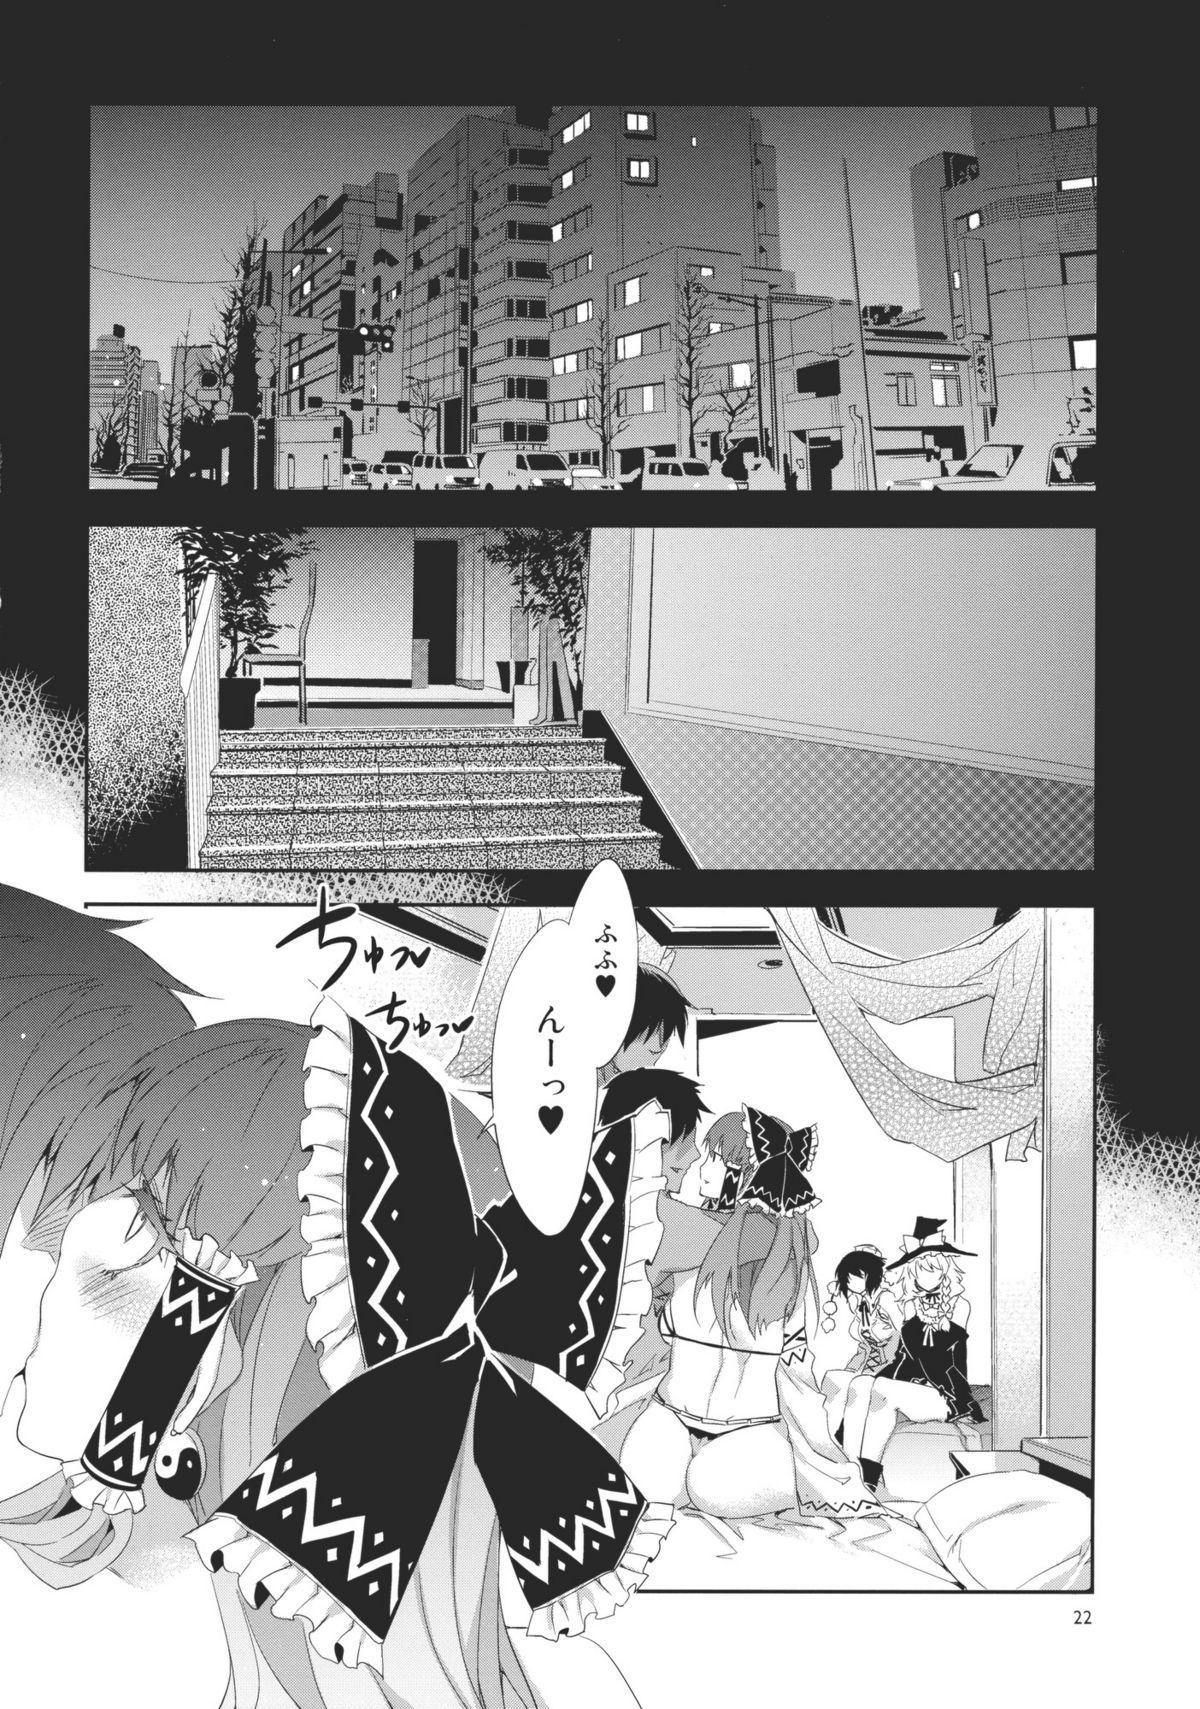 Touhou Gensou Houkai 21